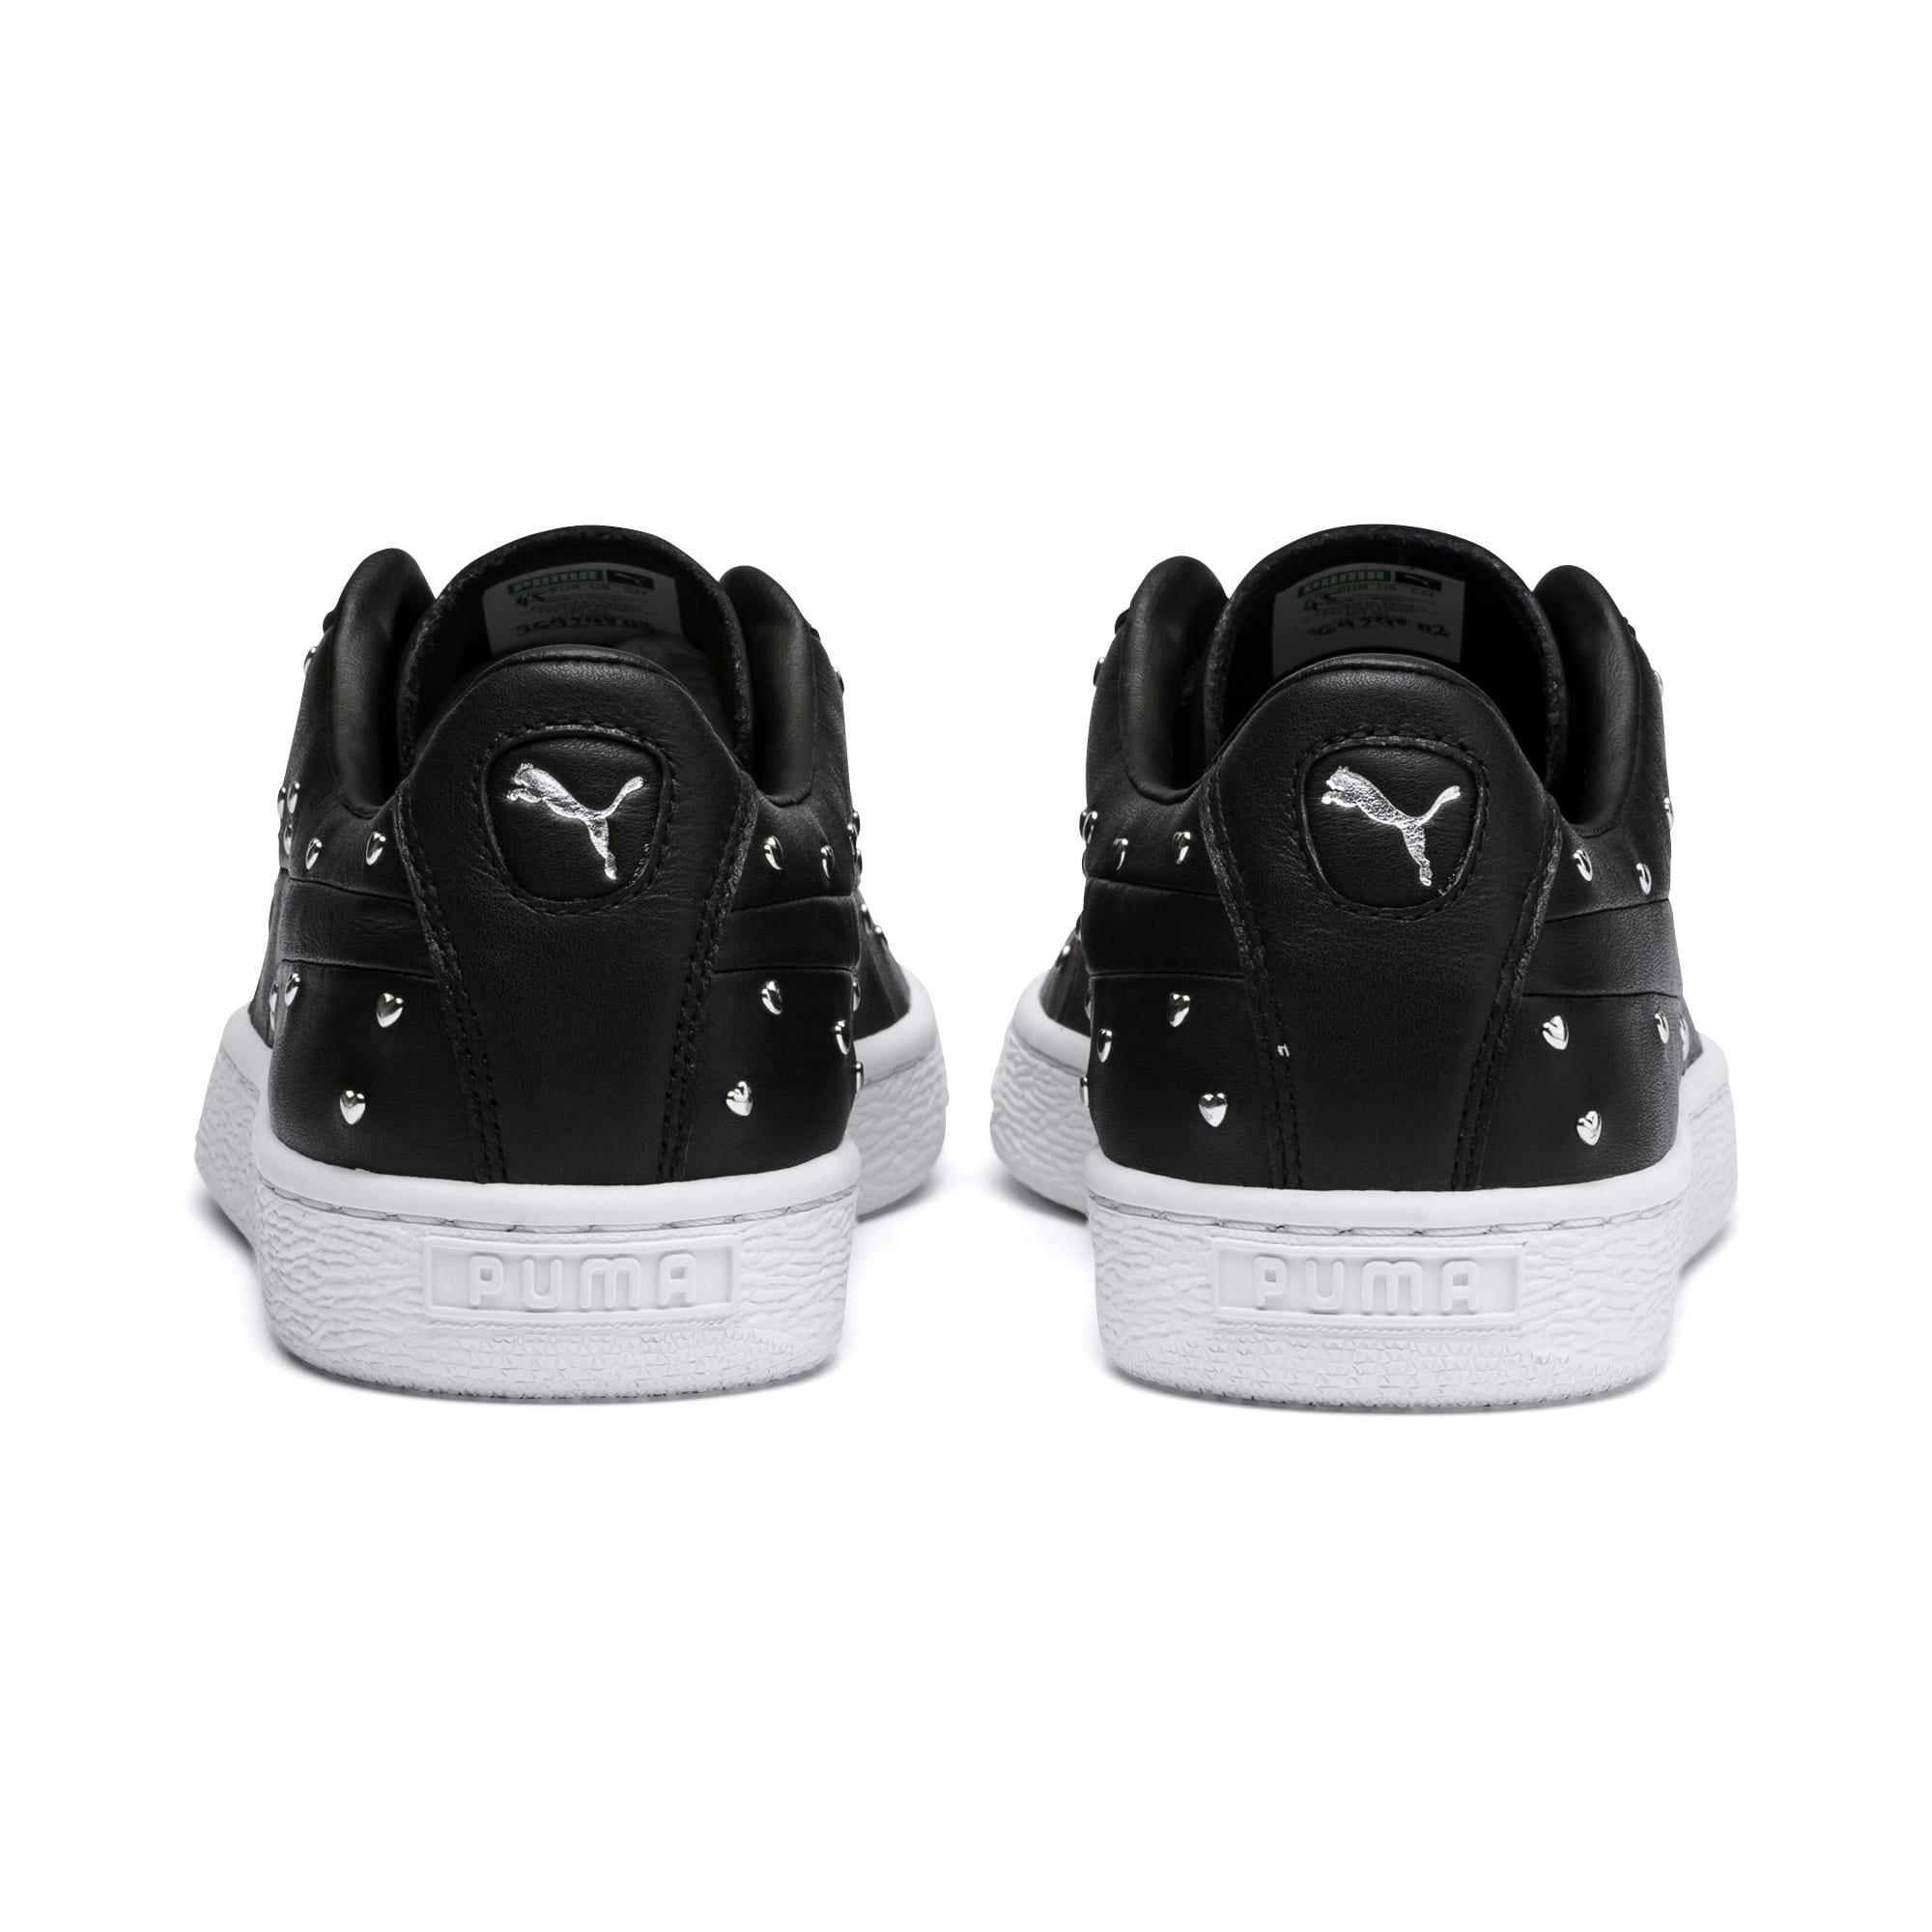 Thumbnail 4 of Basket Studs Women's Sneakers, Puma Black-Puma Silver, medium